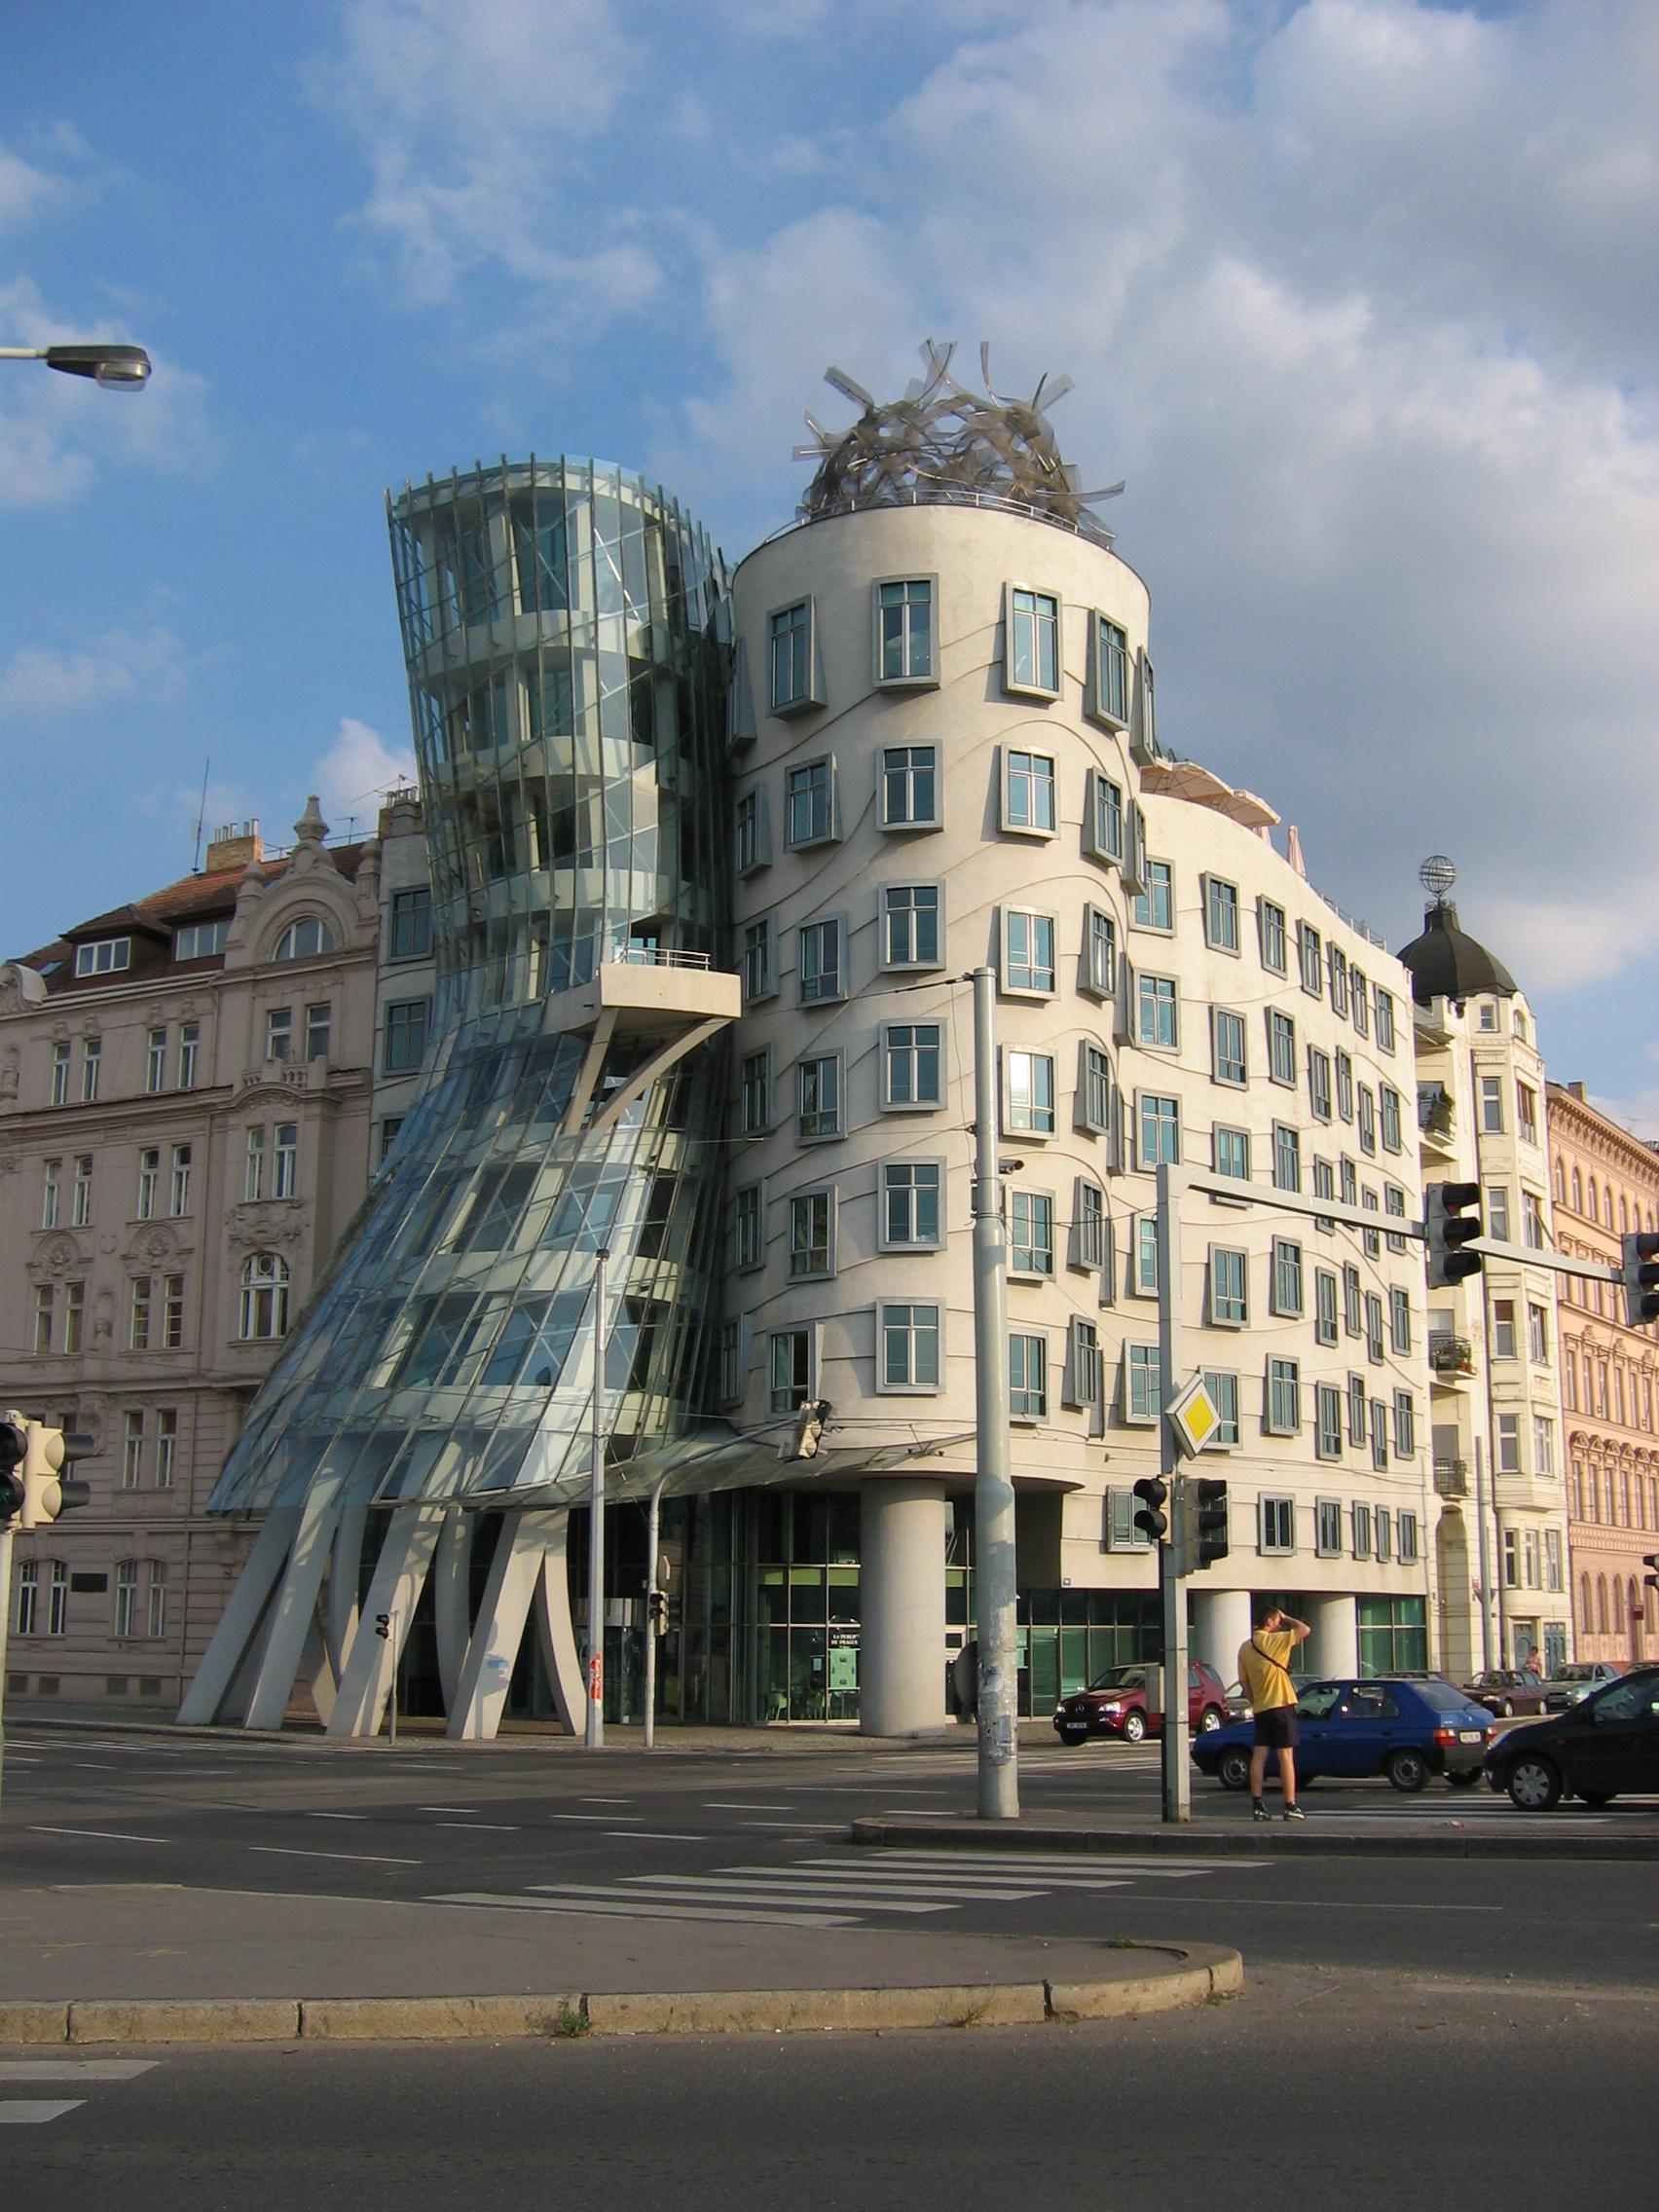 City Hotel Darmstadt Adelungenstr